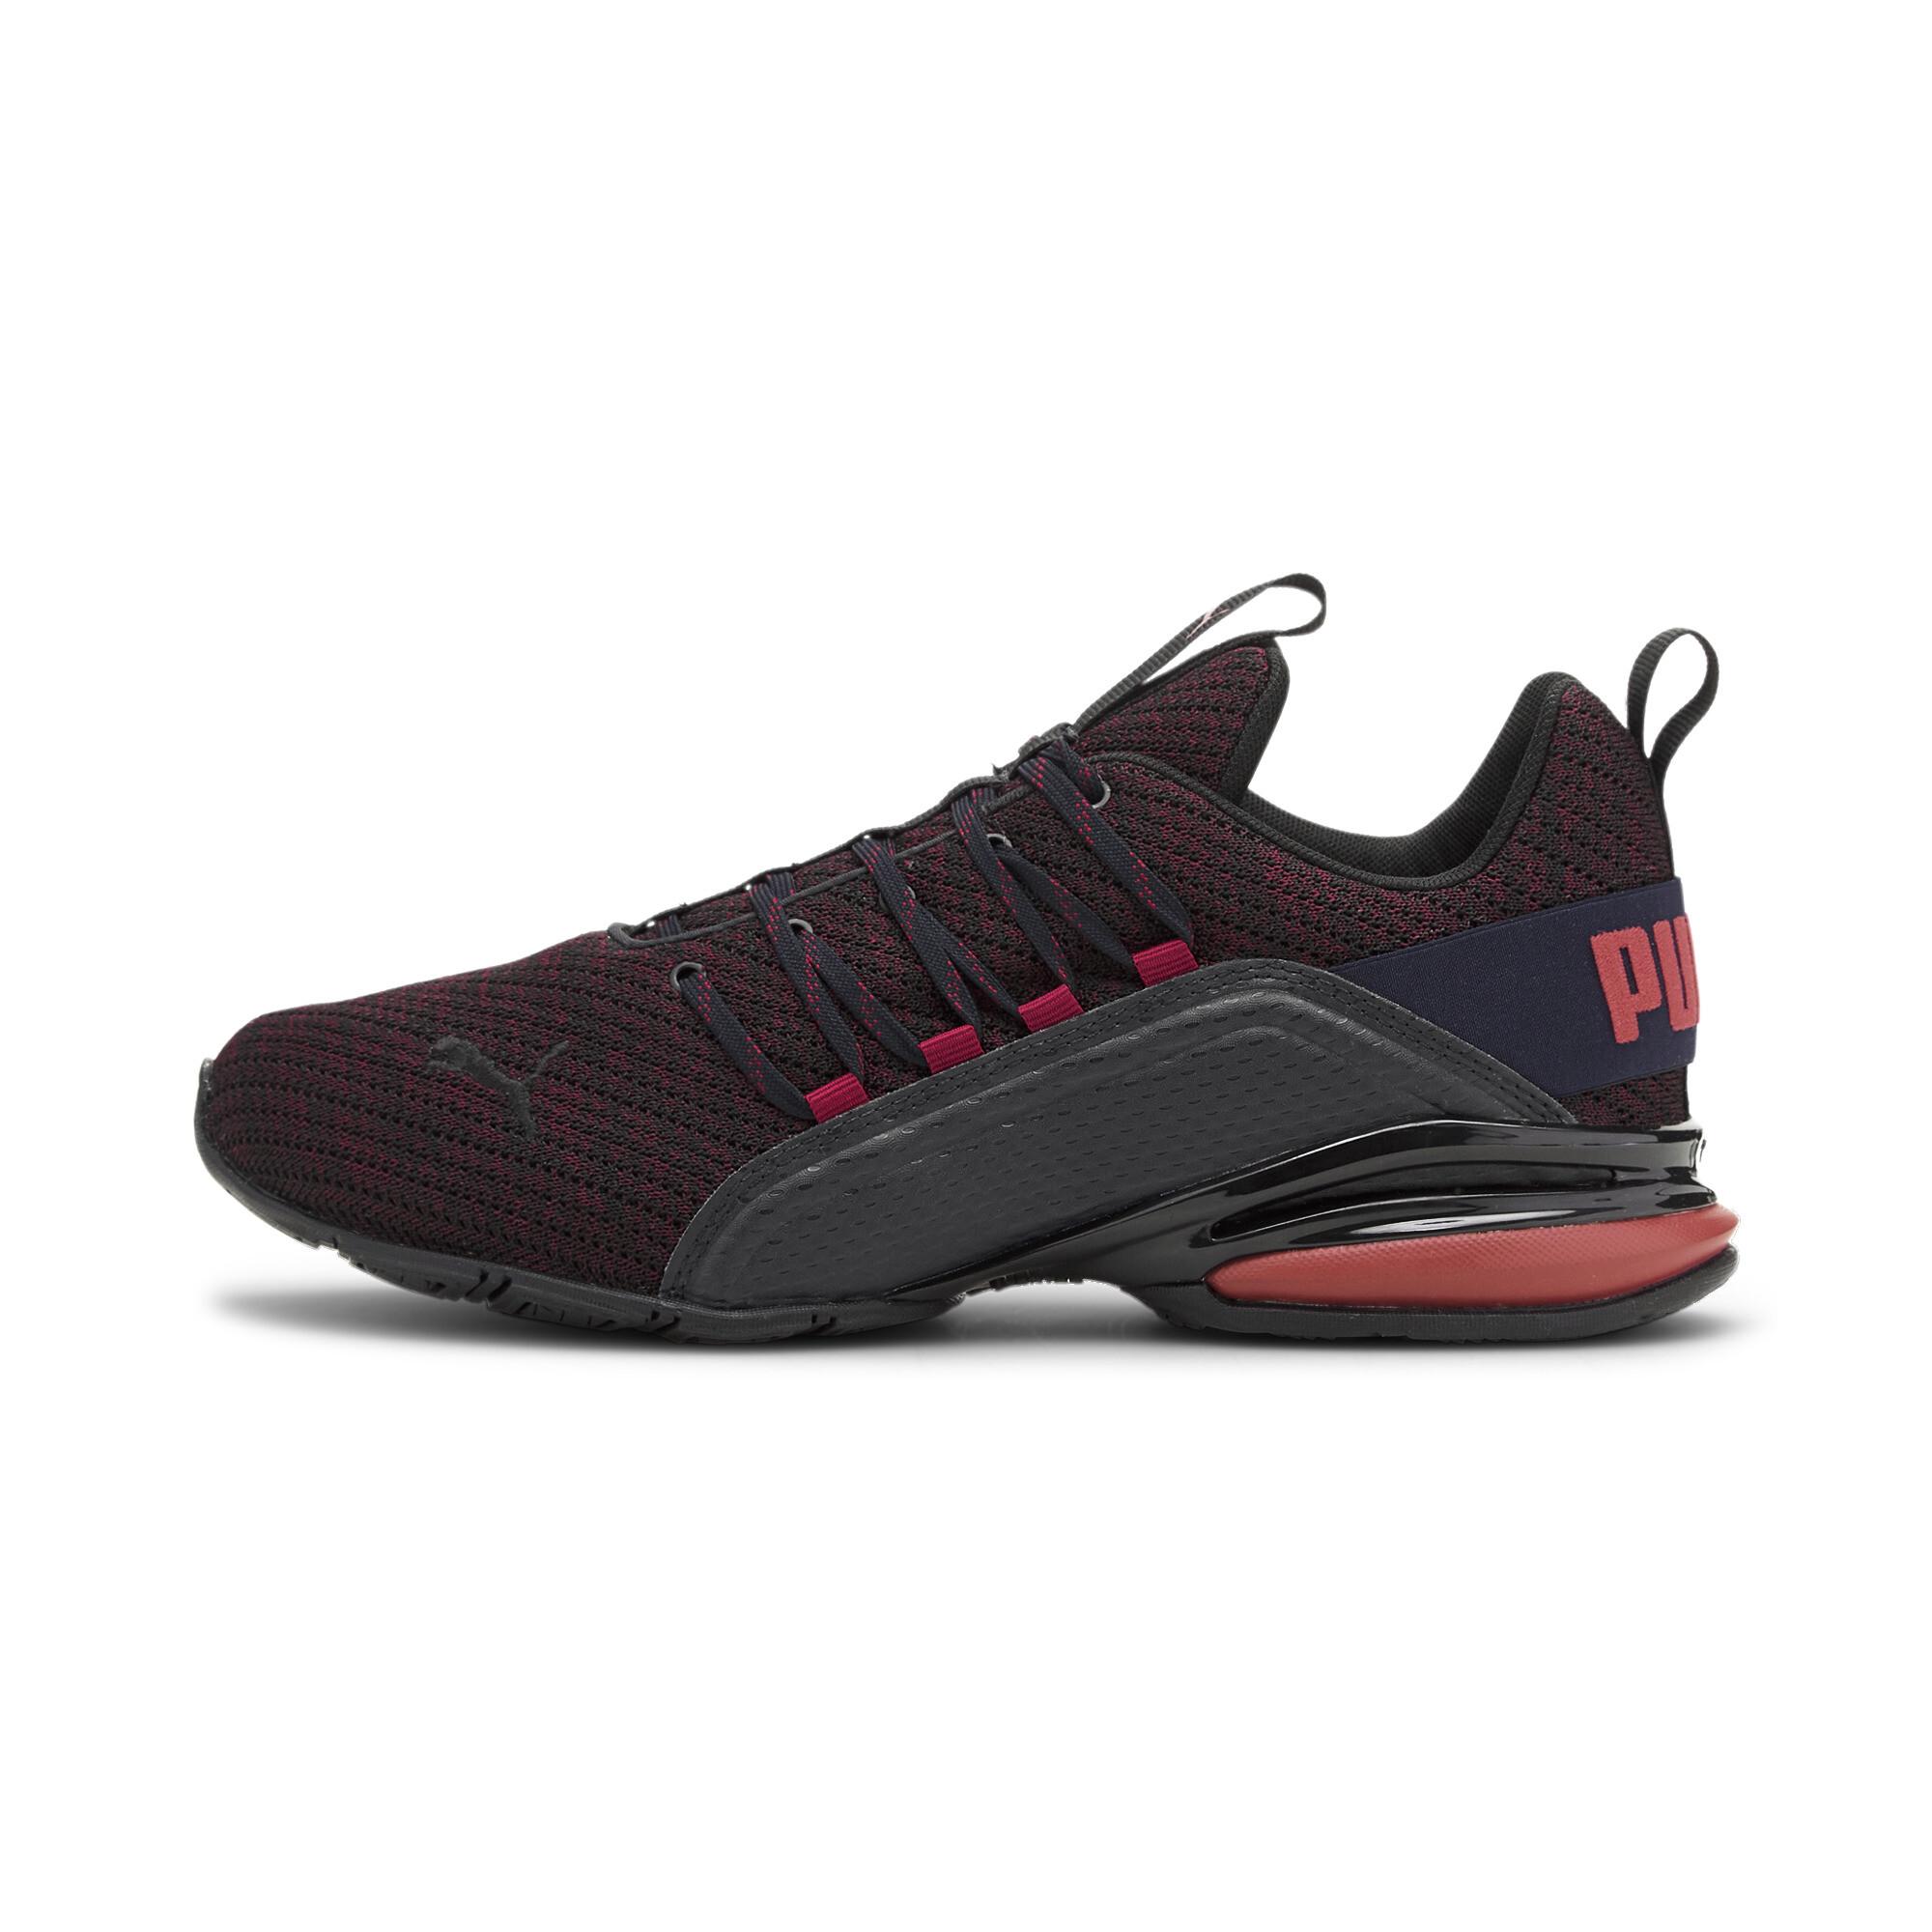 PUMA-Men-039-s-Axelion-Ultra-Running-Shoes thumbnail 11